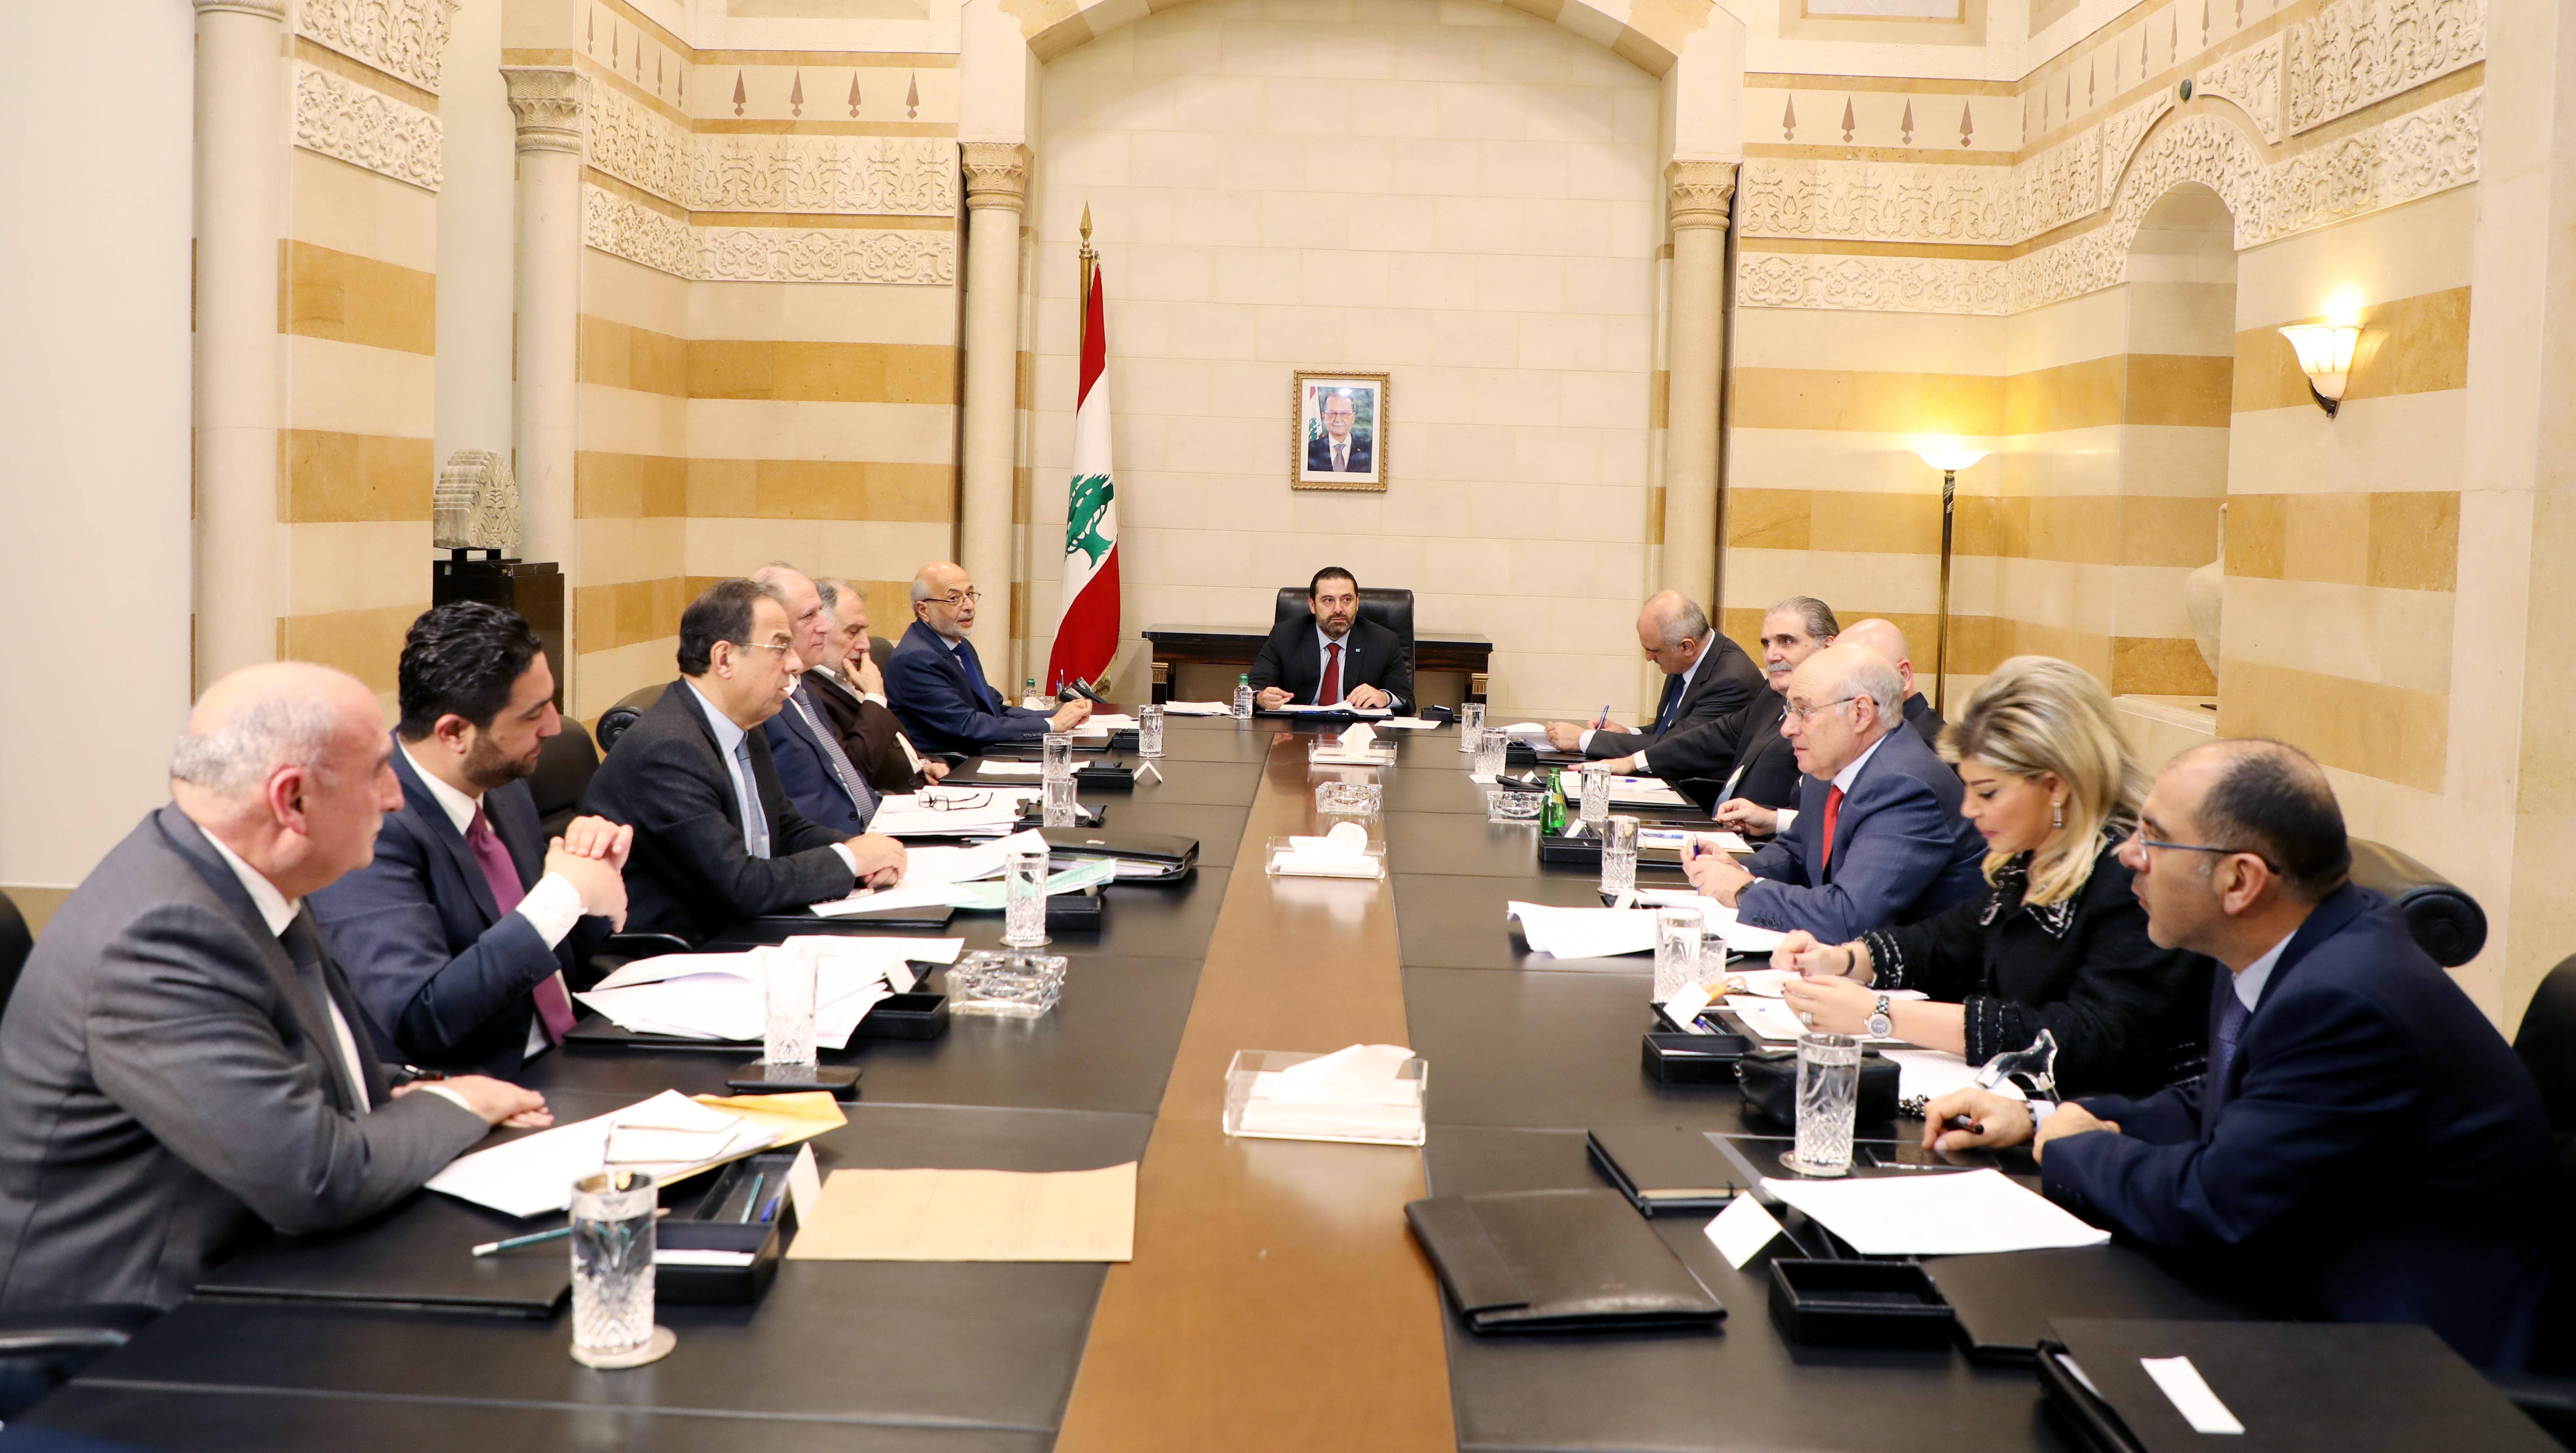 Pr Minister Saad Hariri Heading a Ministerial Cpuncil.jpg 1